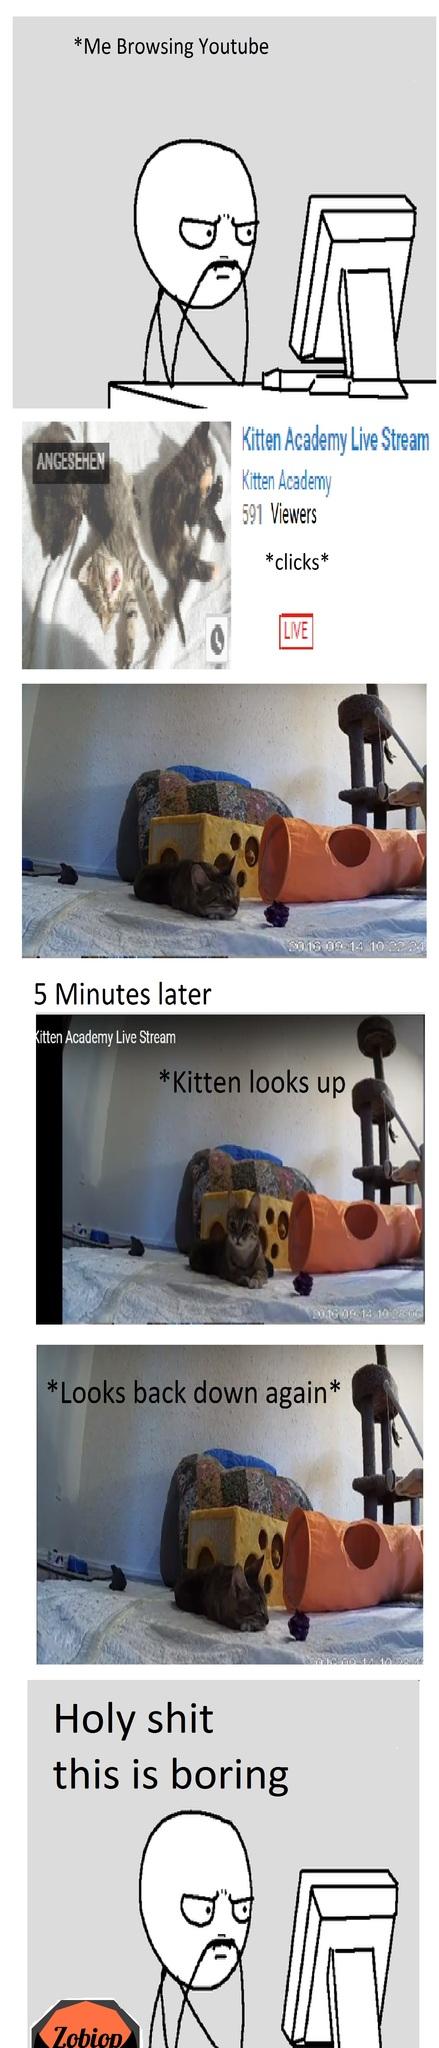 Cat Academy - meme